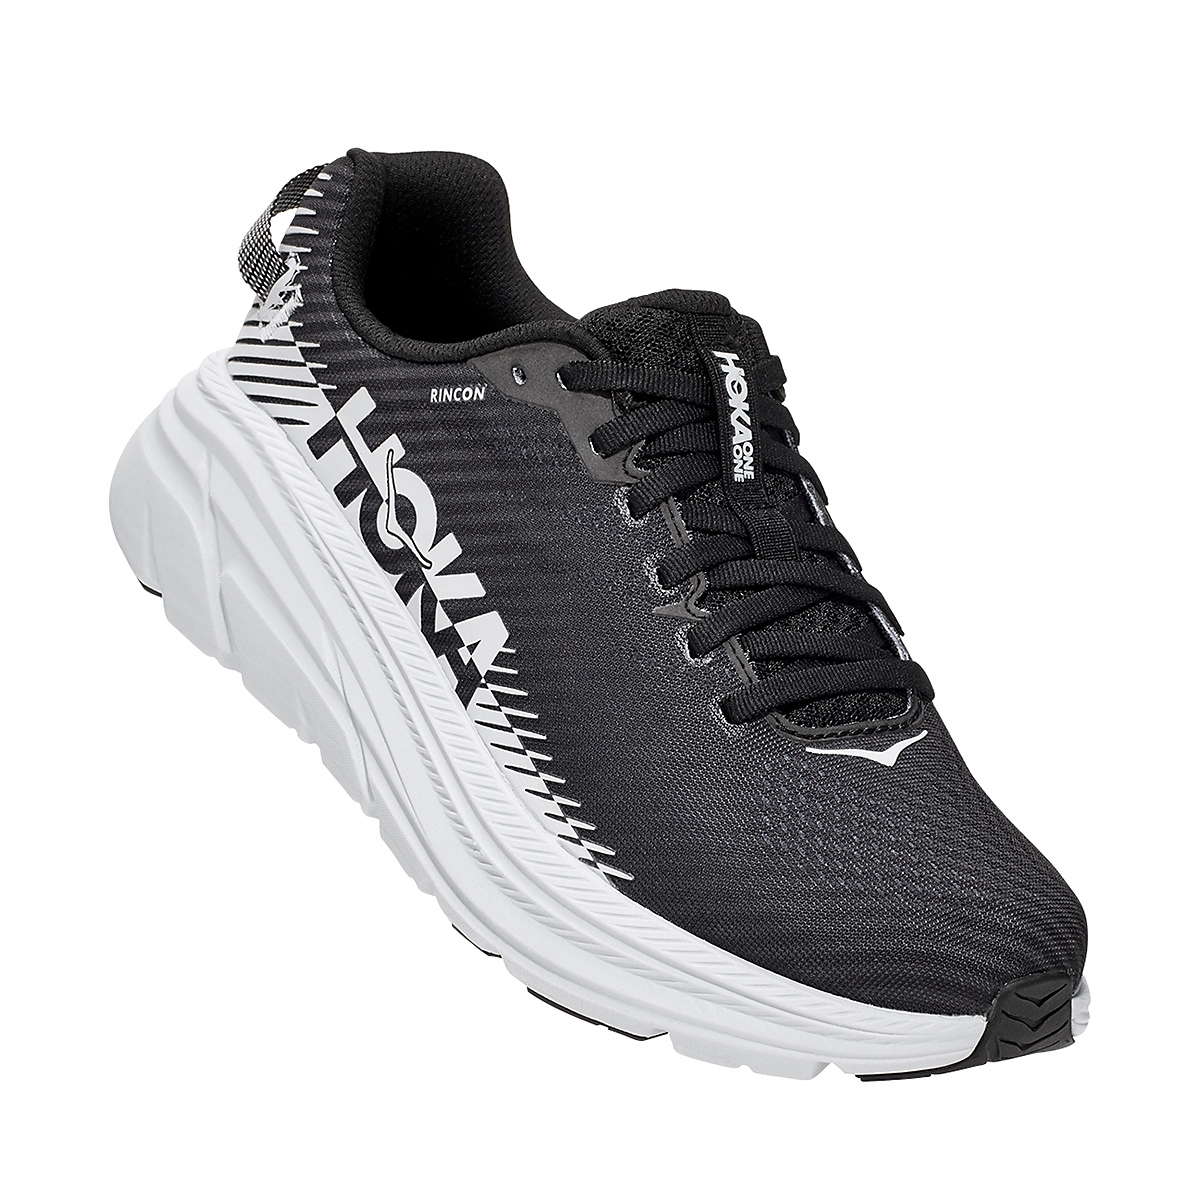 Women's Hoka One One Rincon 2 Running Shoe - Color: Black/White - Size: 5 - Width: Regular, Black/White, large, image 2